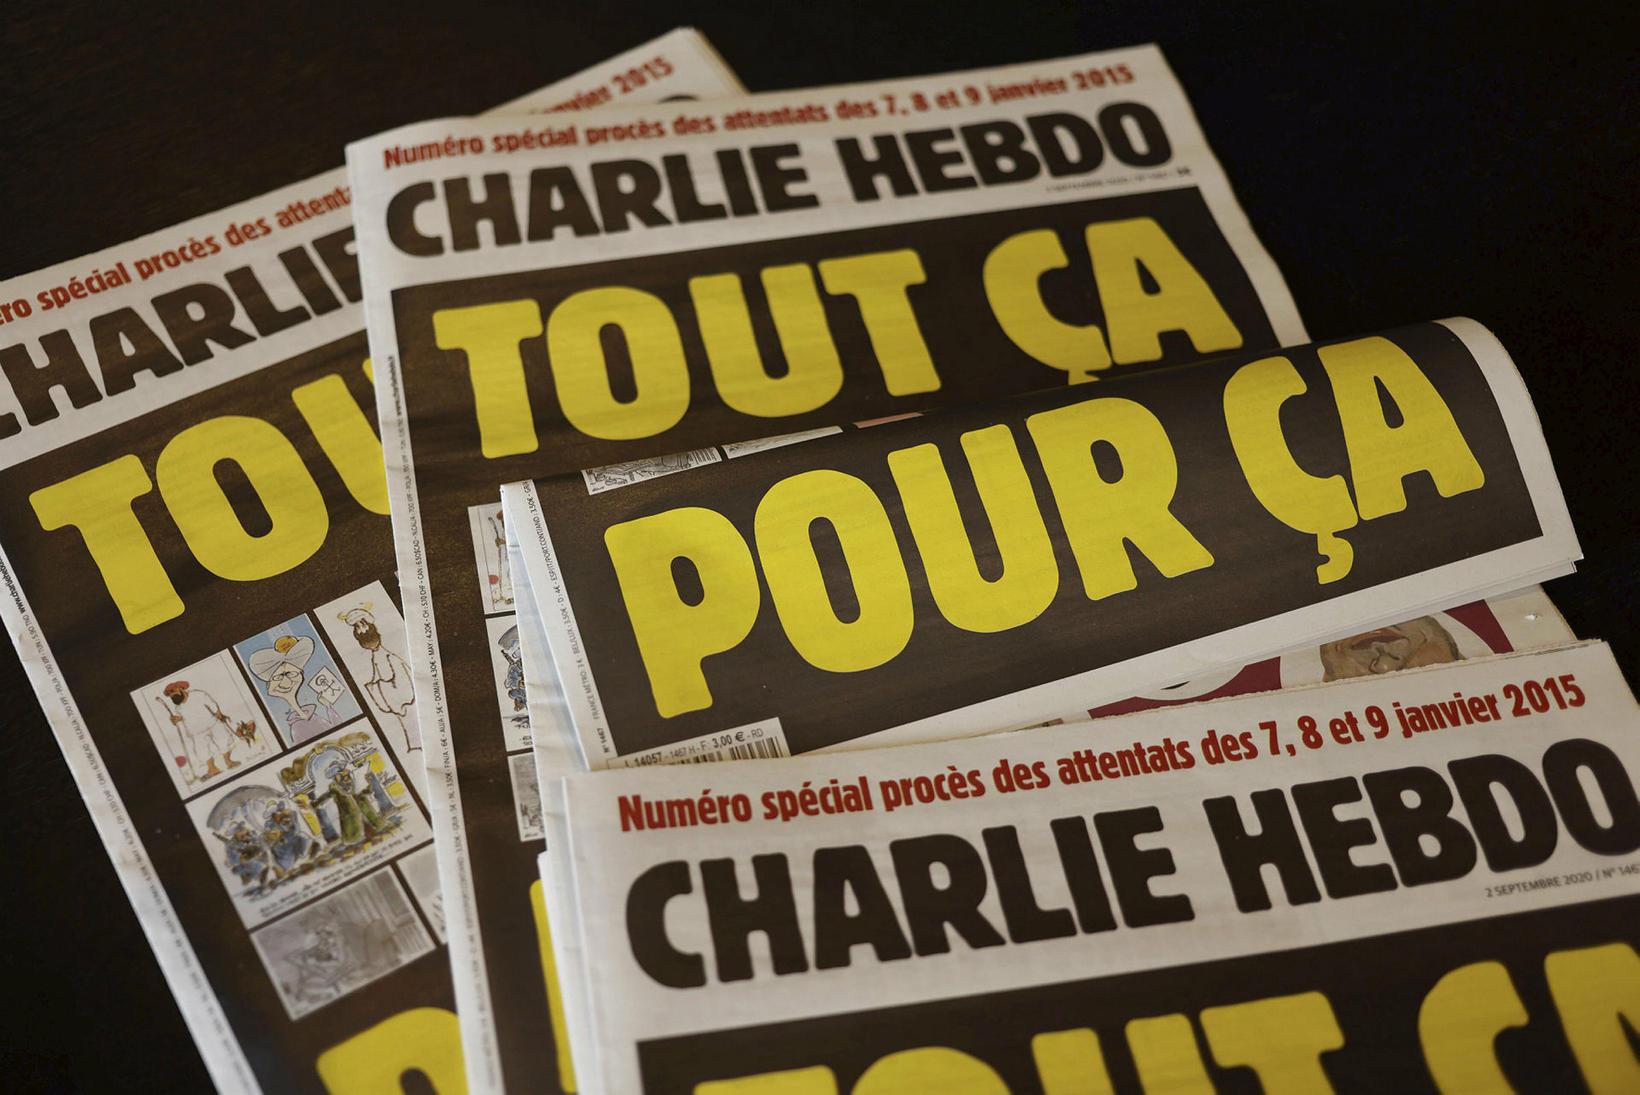 Forsíða Charlie Hebdo í gær.